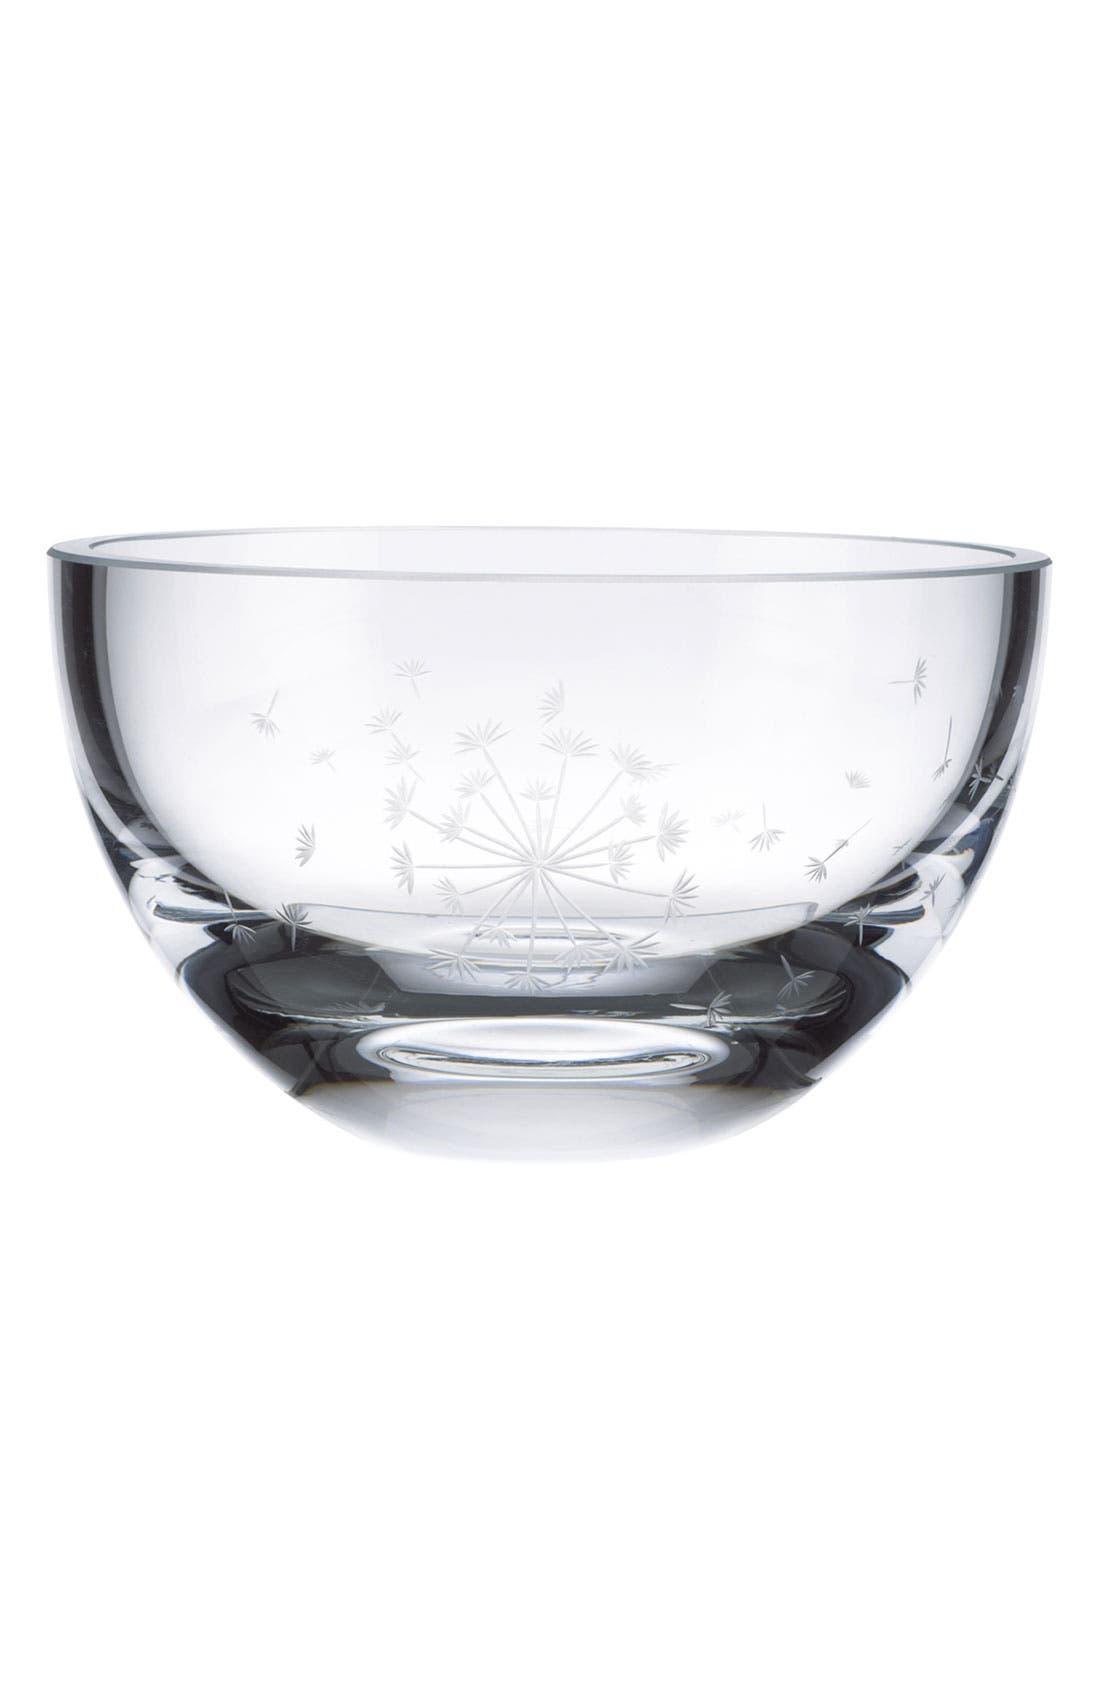 Alternate Image 1 Selected - kate spade new york 'dandy lane' bowl